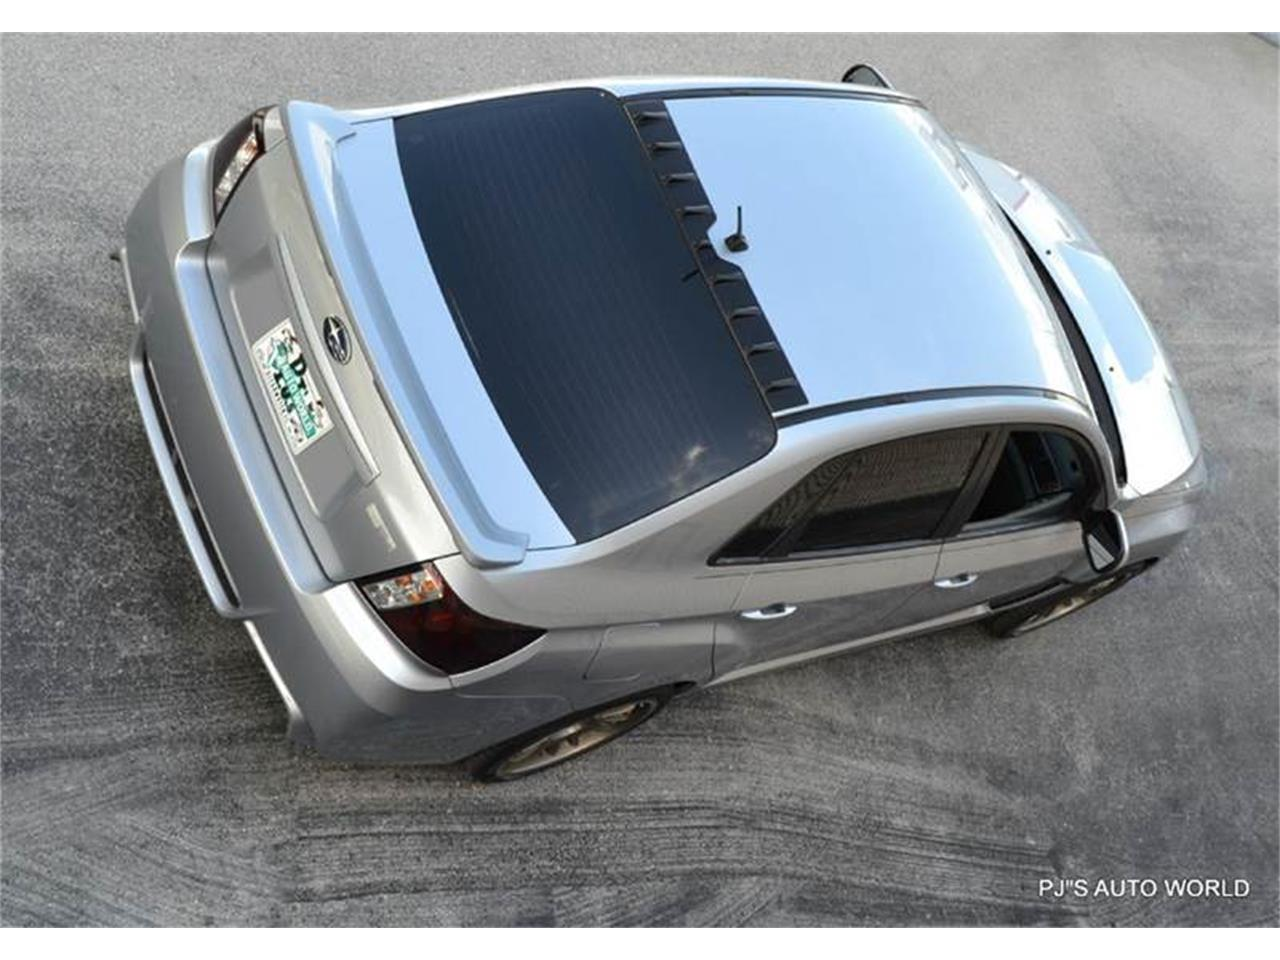 Large Picture of '13 Subaru Impreza - $19,900.00 Offered by PJ's Auto World - J6WM